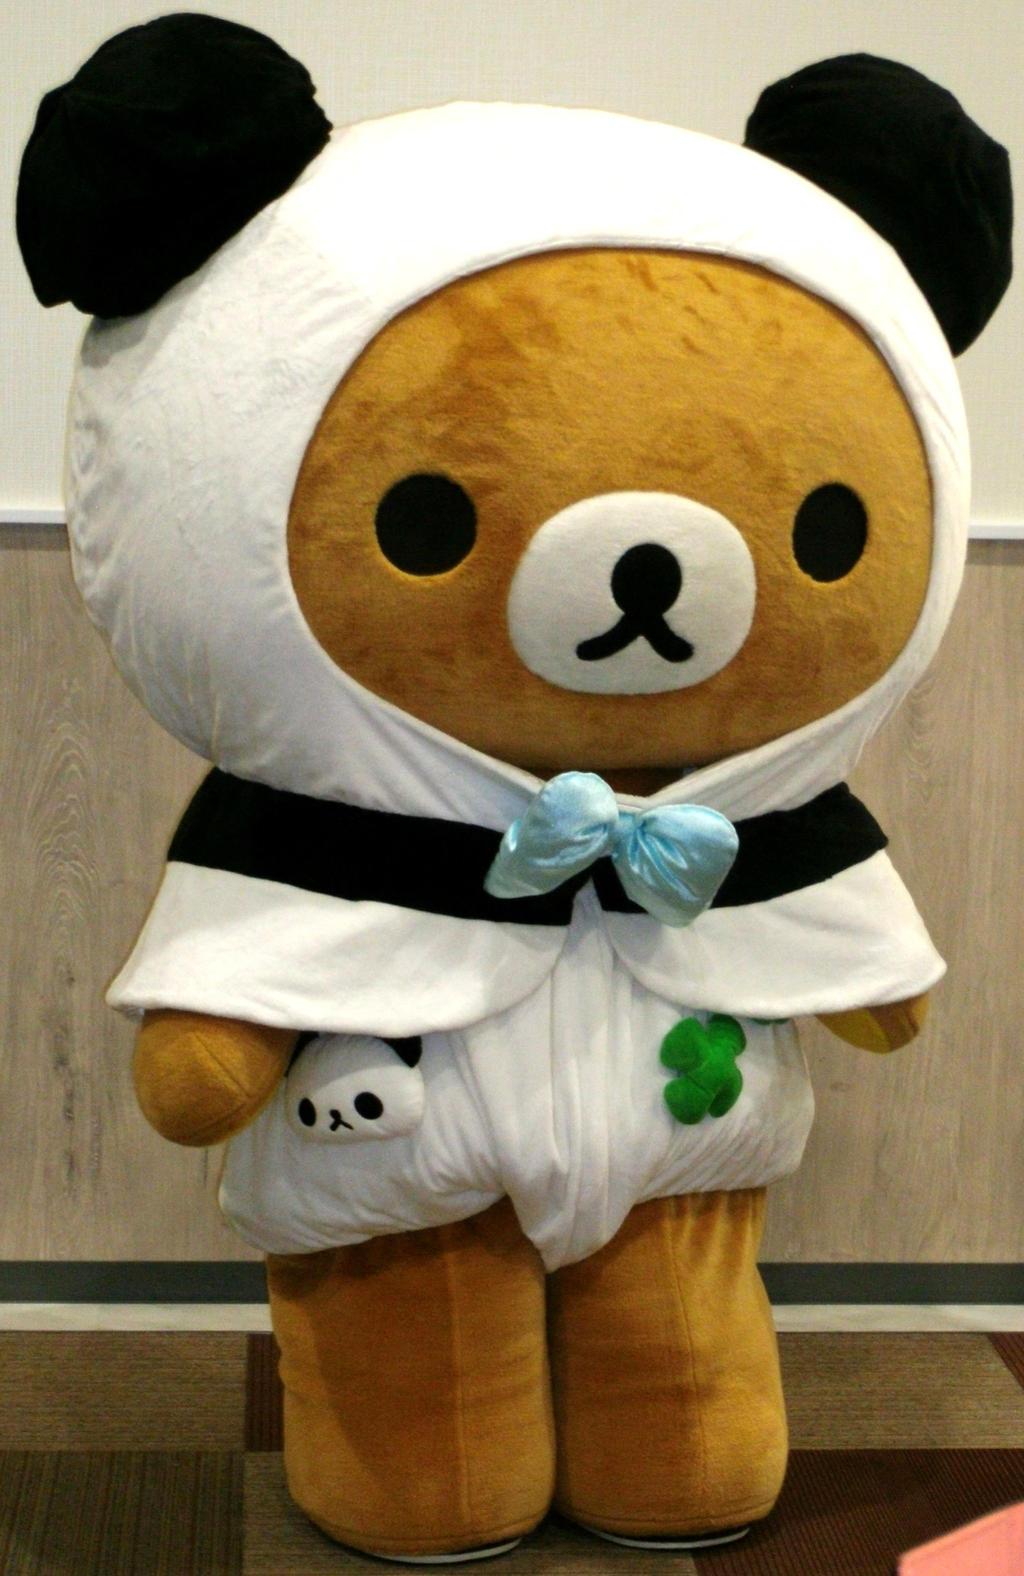 Rilakkuma meets Panda de goron 1 by yellowmocha